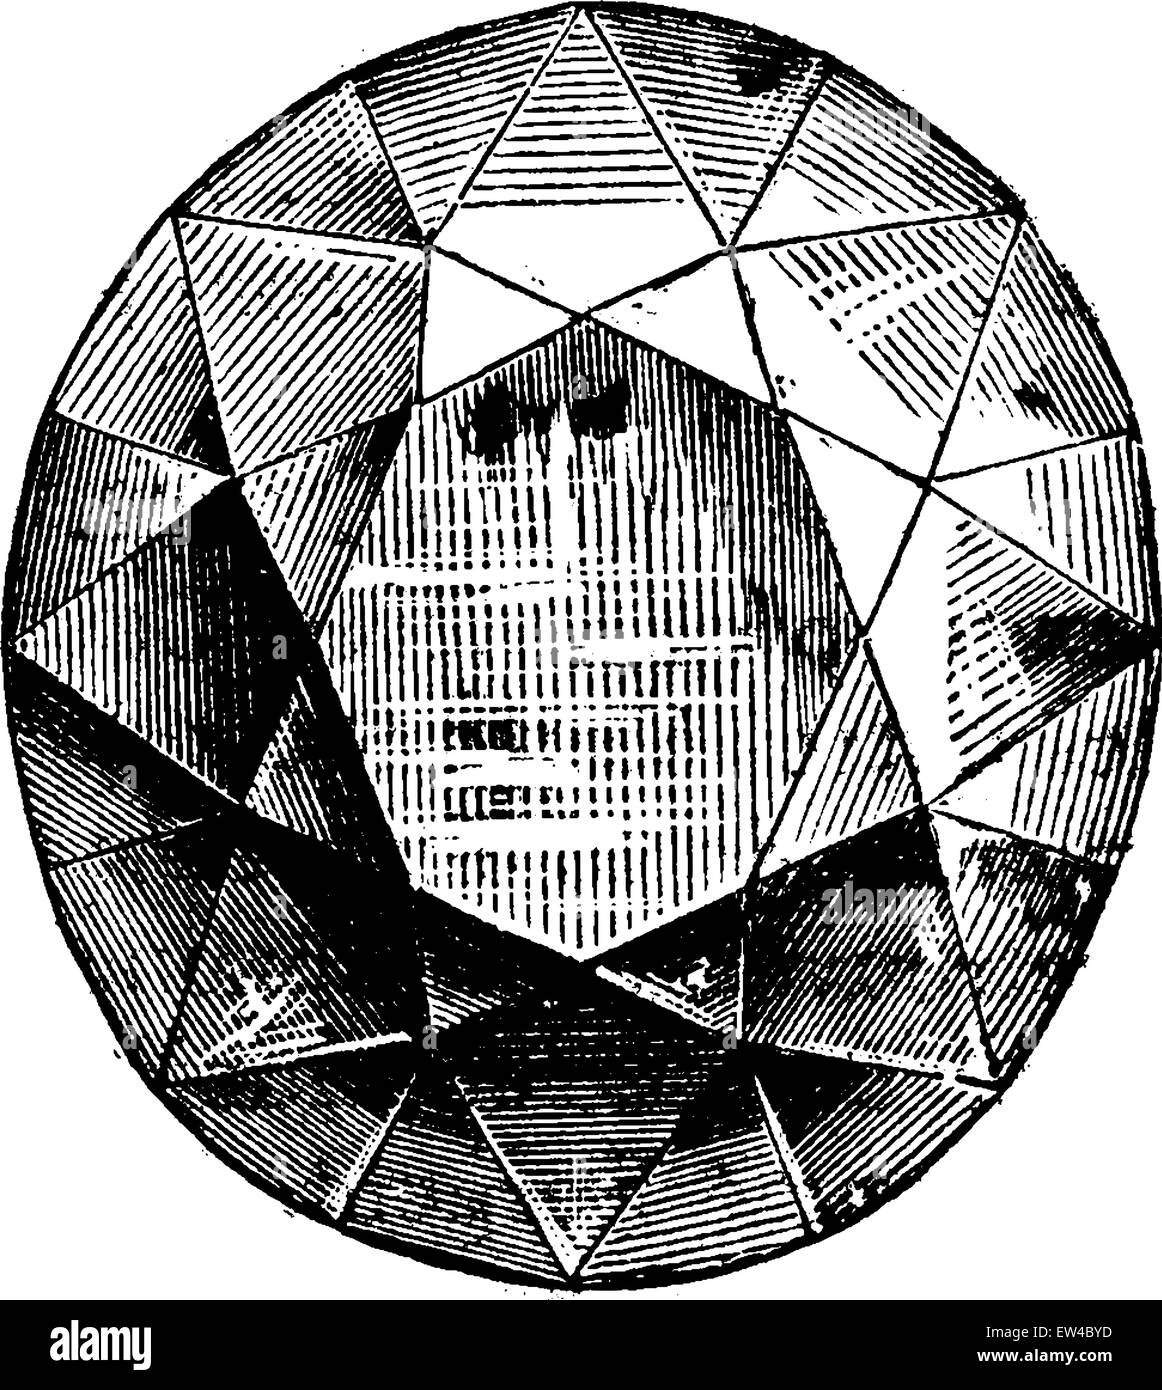 The Koh-i-noor, vintage engraved illustration. Industrial encyclopedia E.-O. Lami - 1875. - Stock Image